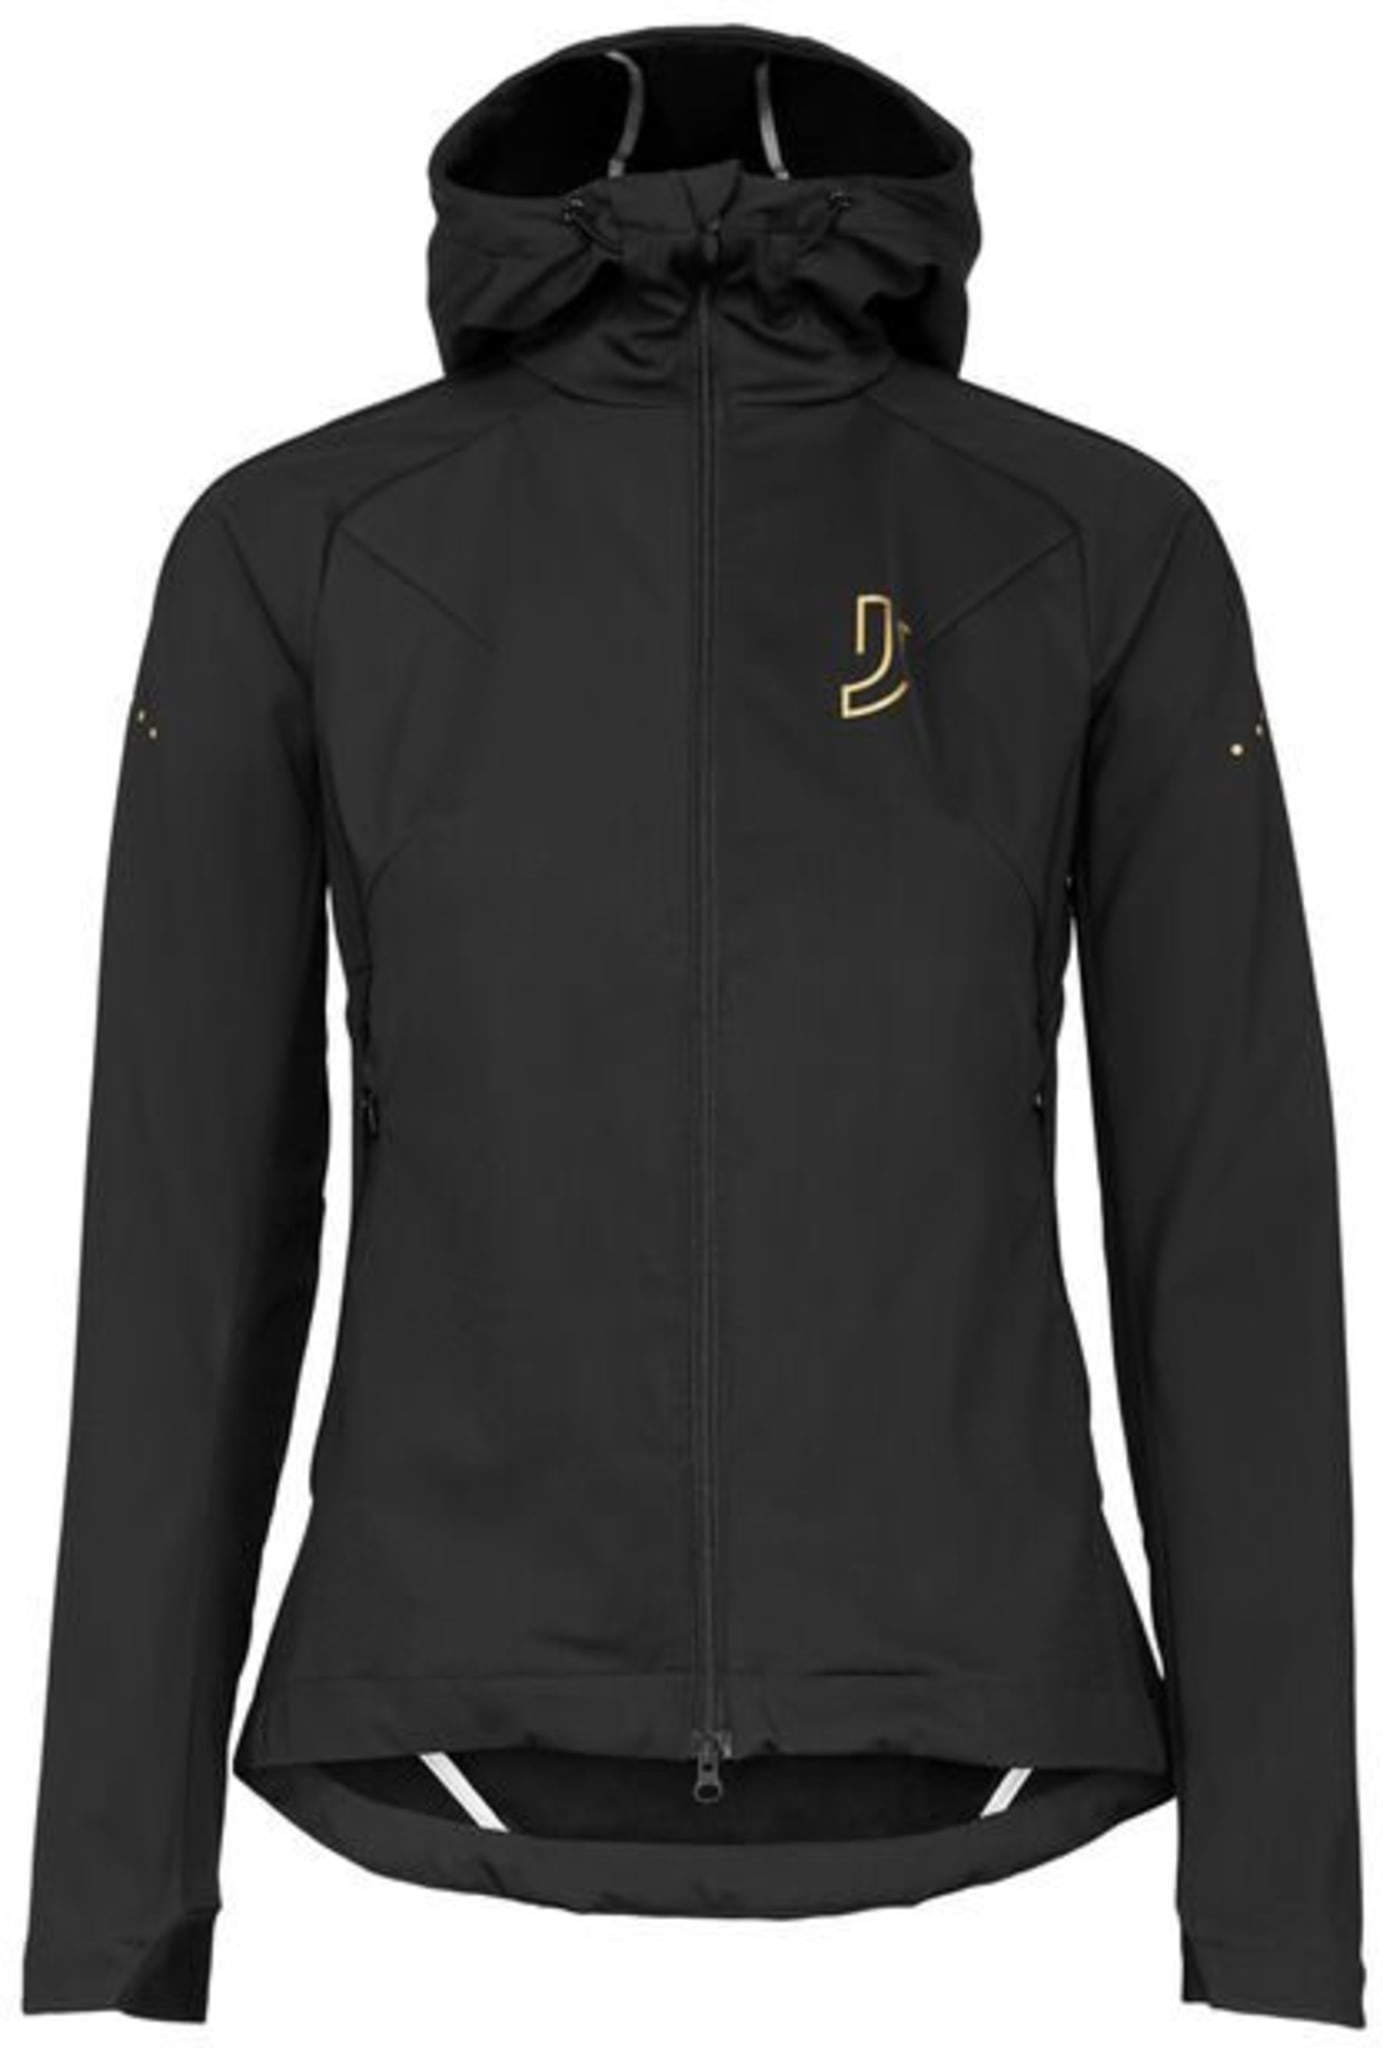 Accelerate Jacket 2.0